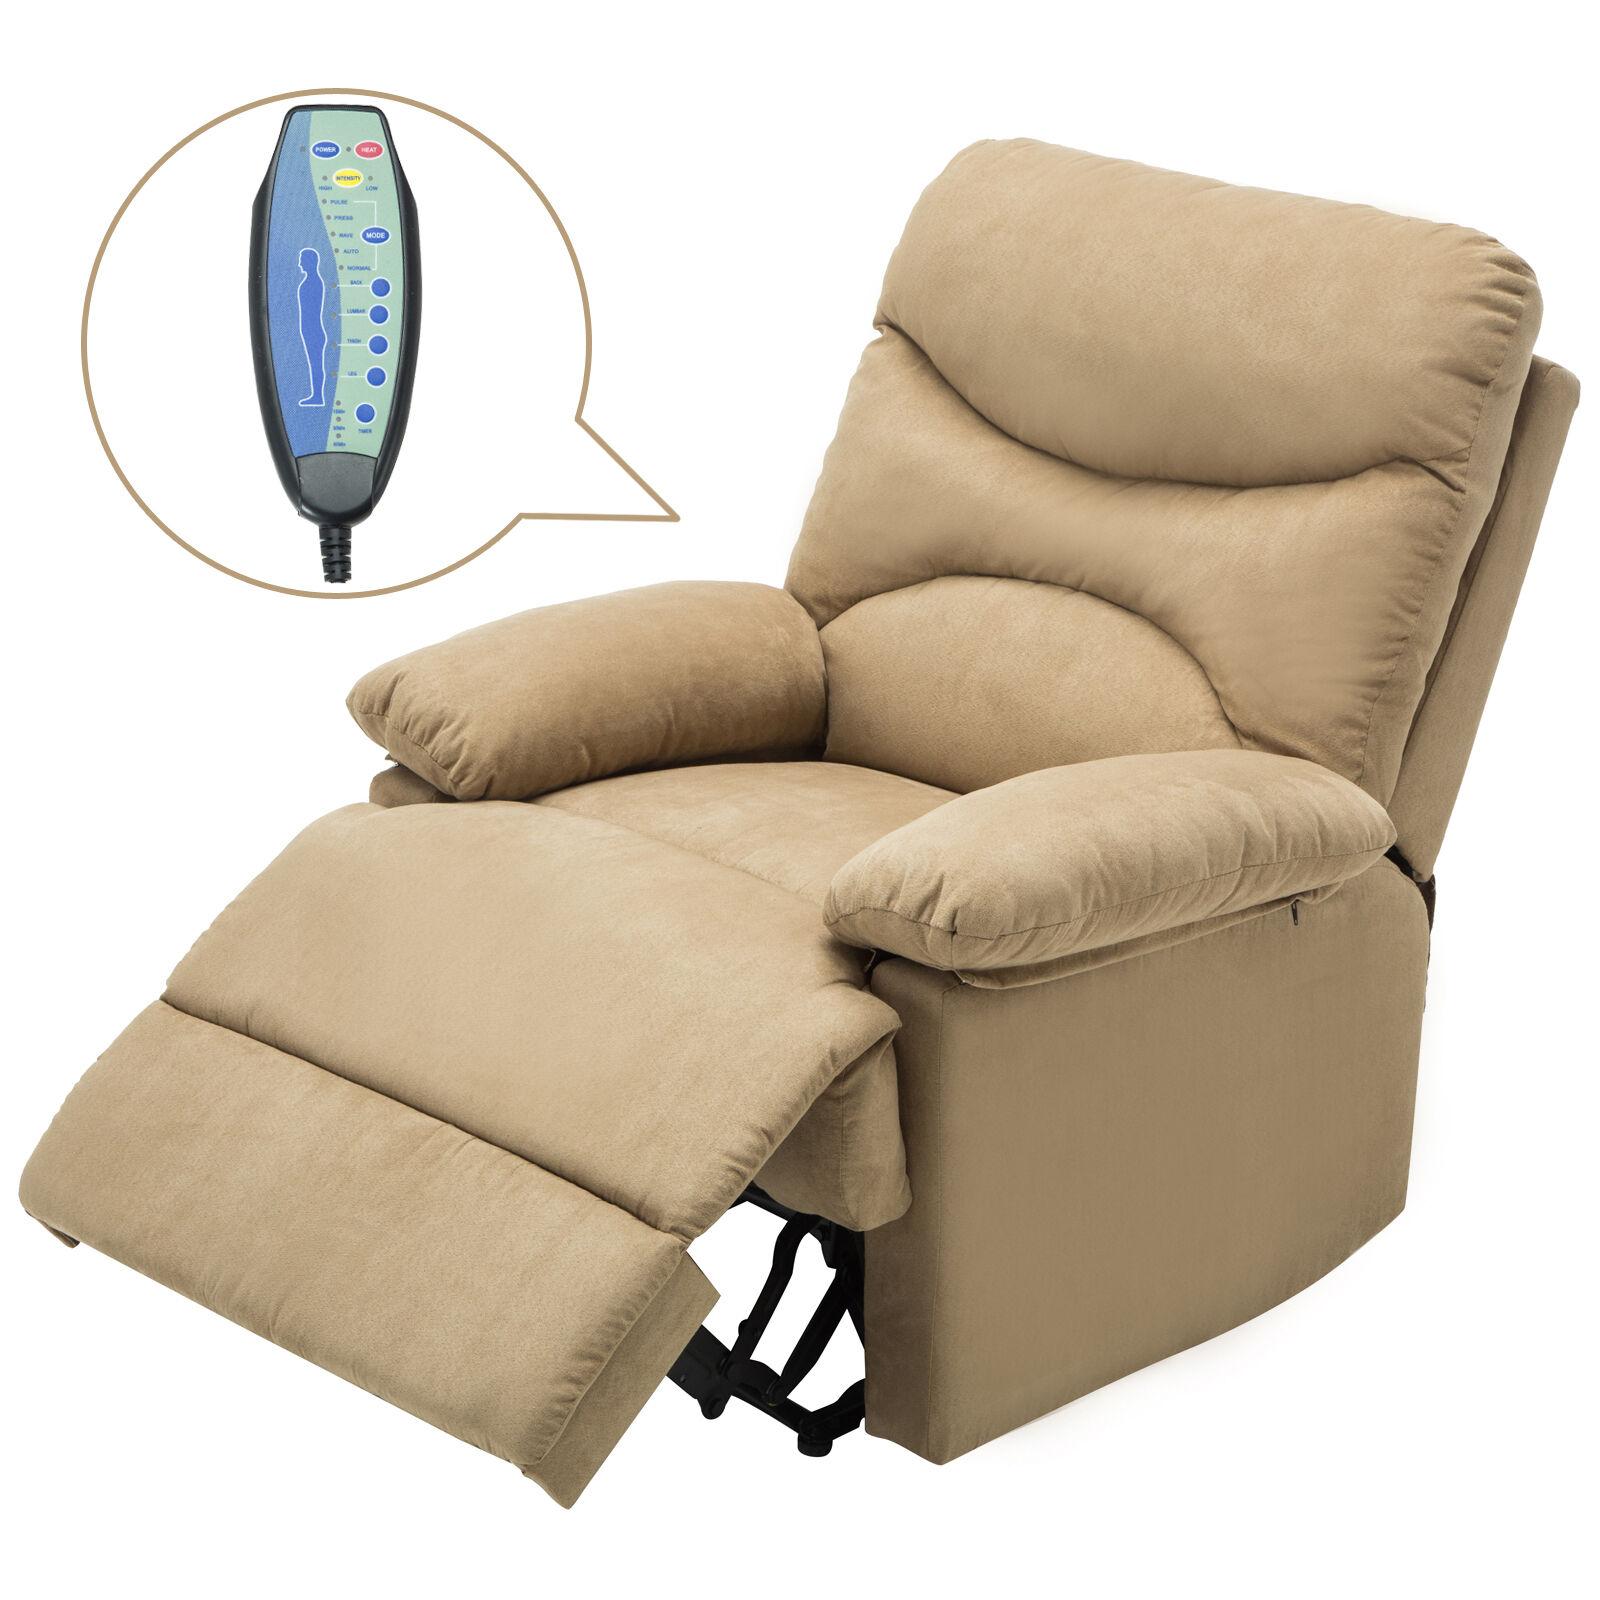 Massage Recliner Sofa Chair Ergonomic Lounge Microfiber Swivel Heated  W/Control